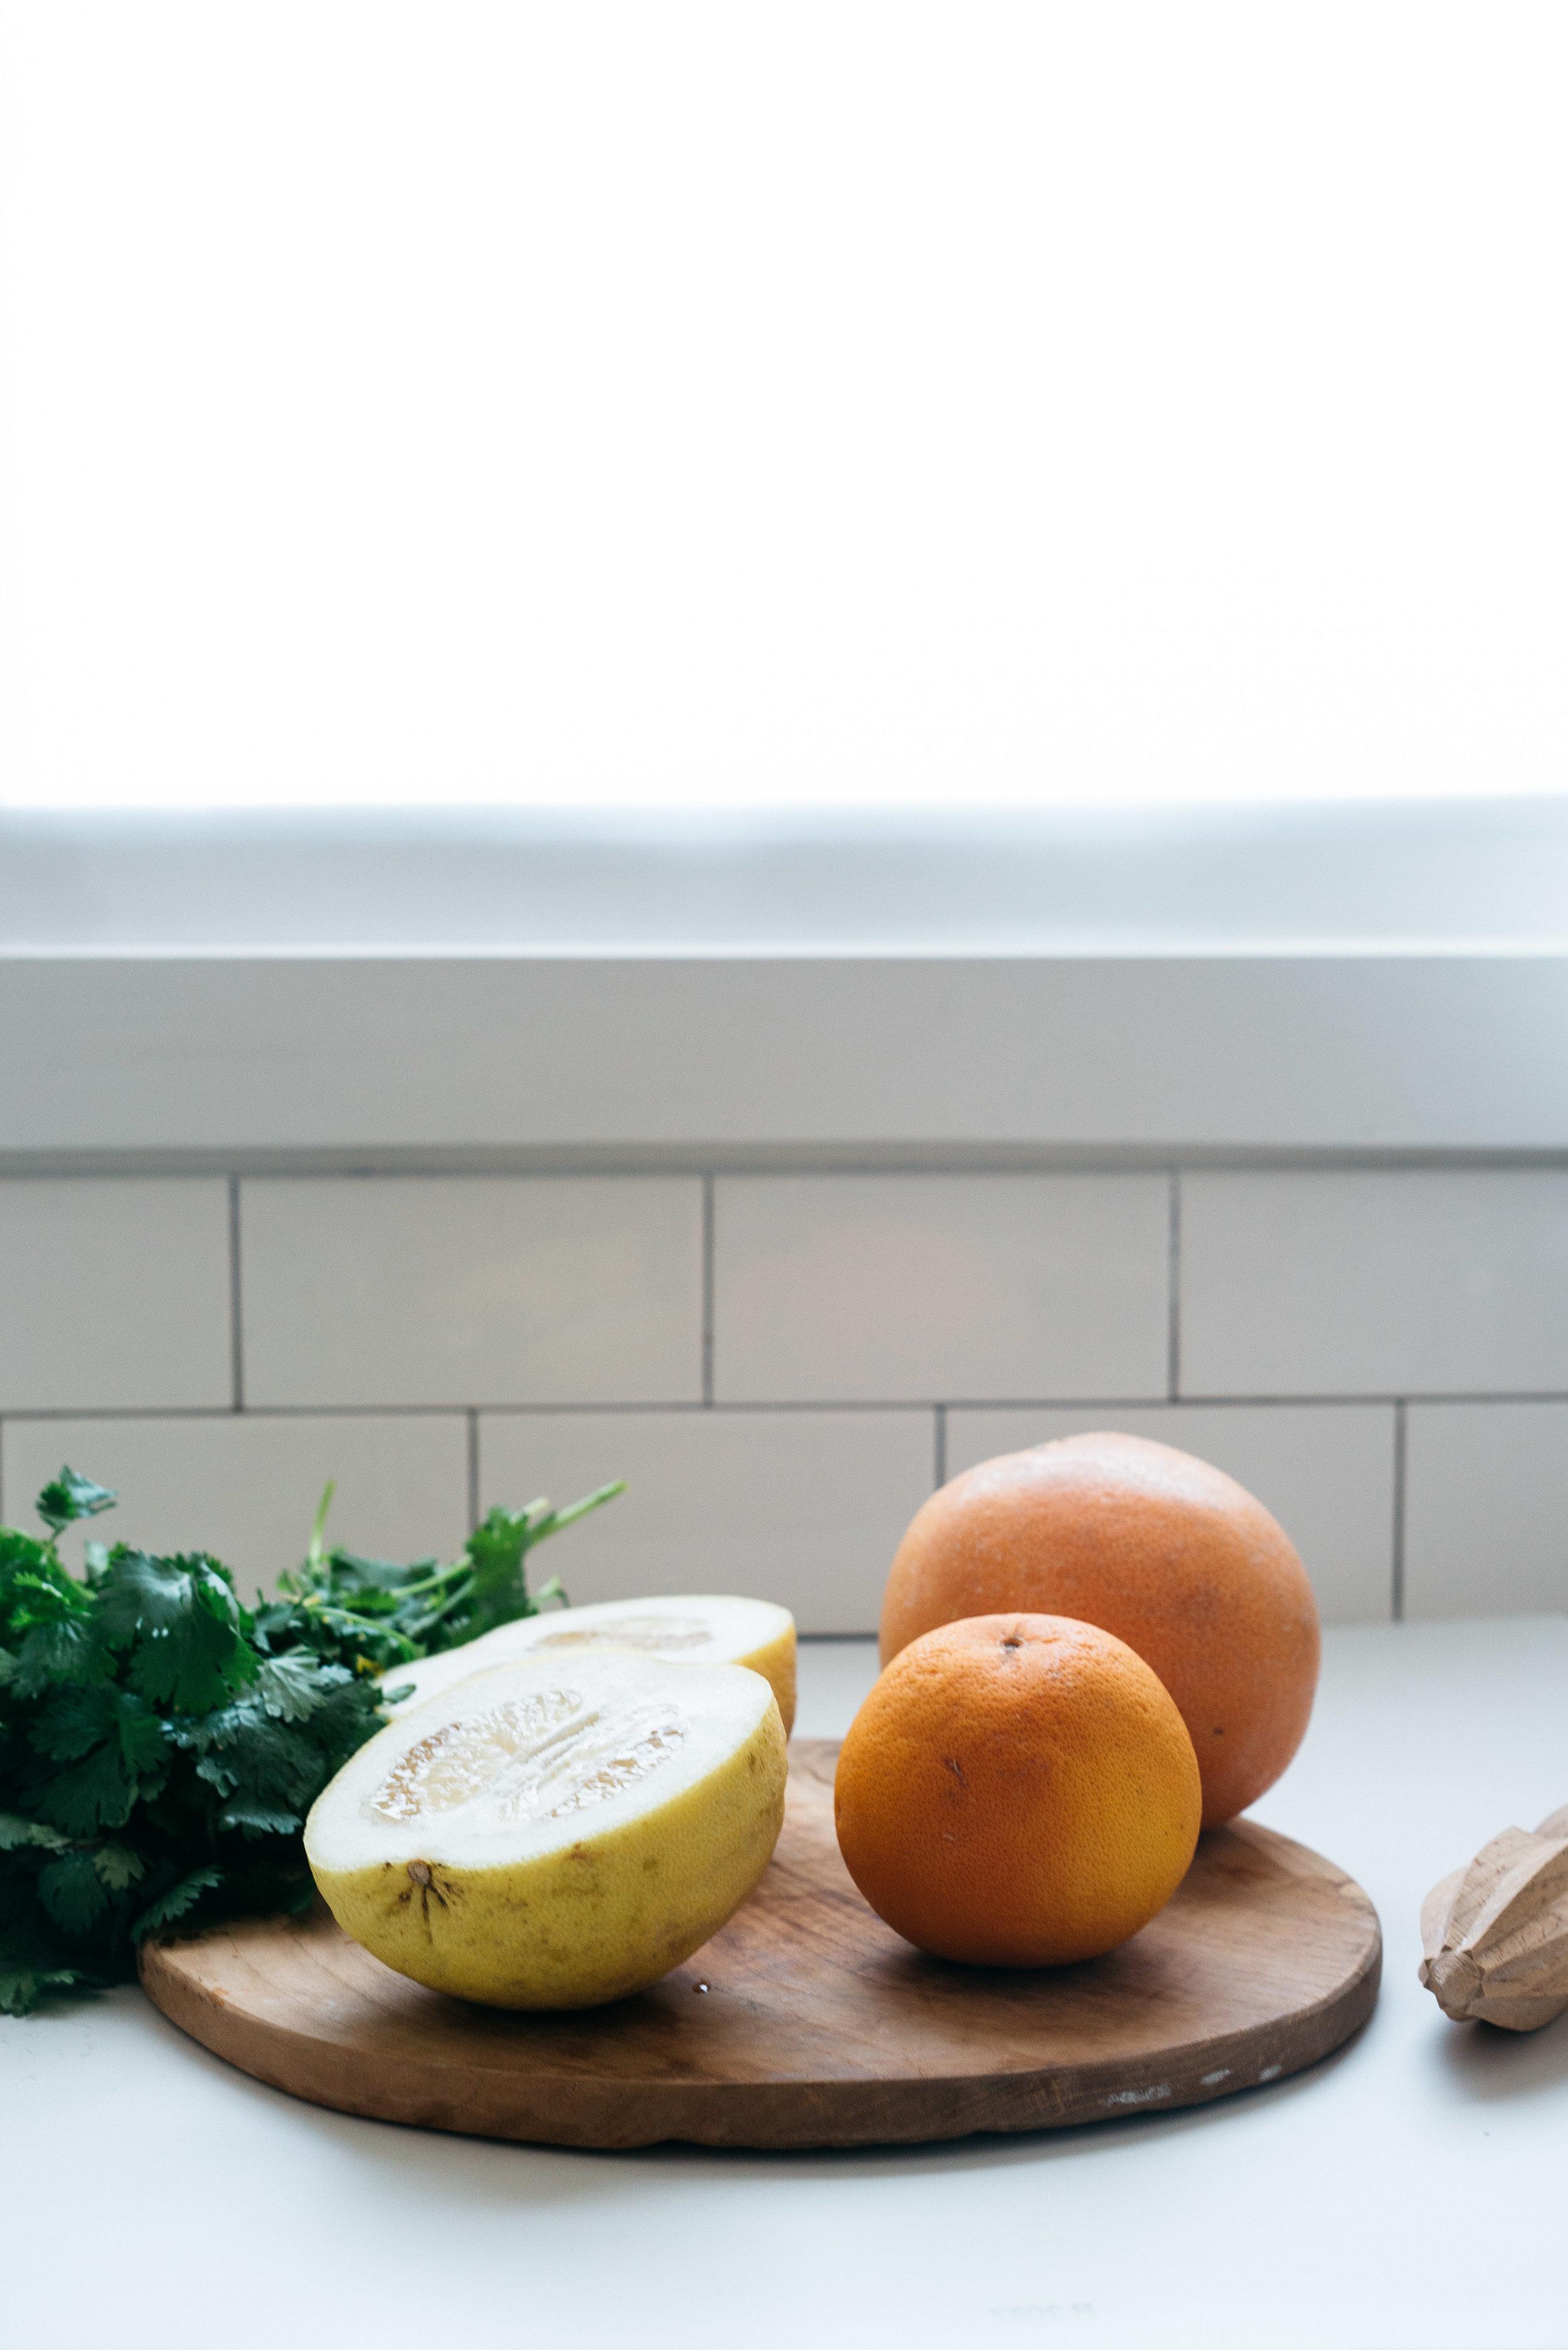 Cilantro-Grapefruit Mezcal Spritz | Dolly and Oatmeal